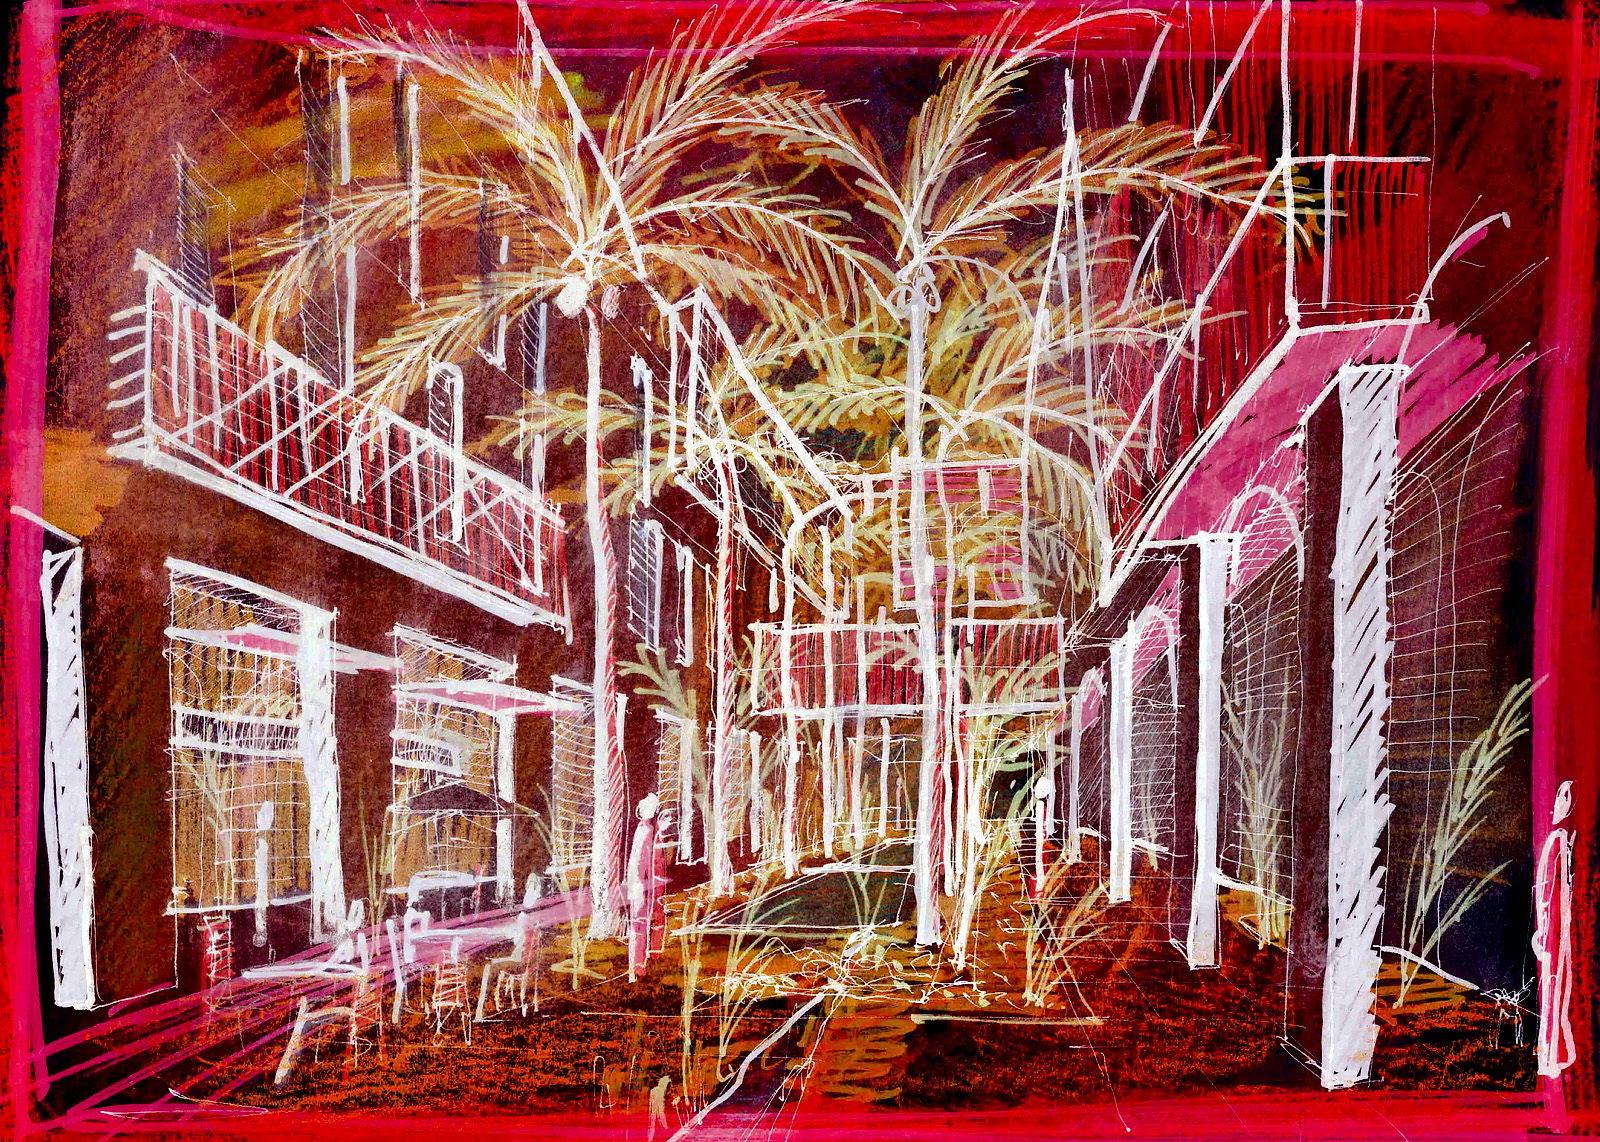 hotelový komplex   Basra - Irák   02